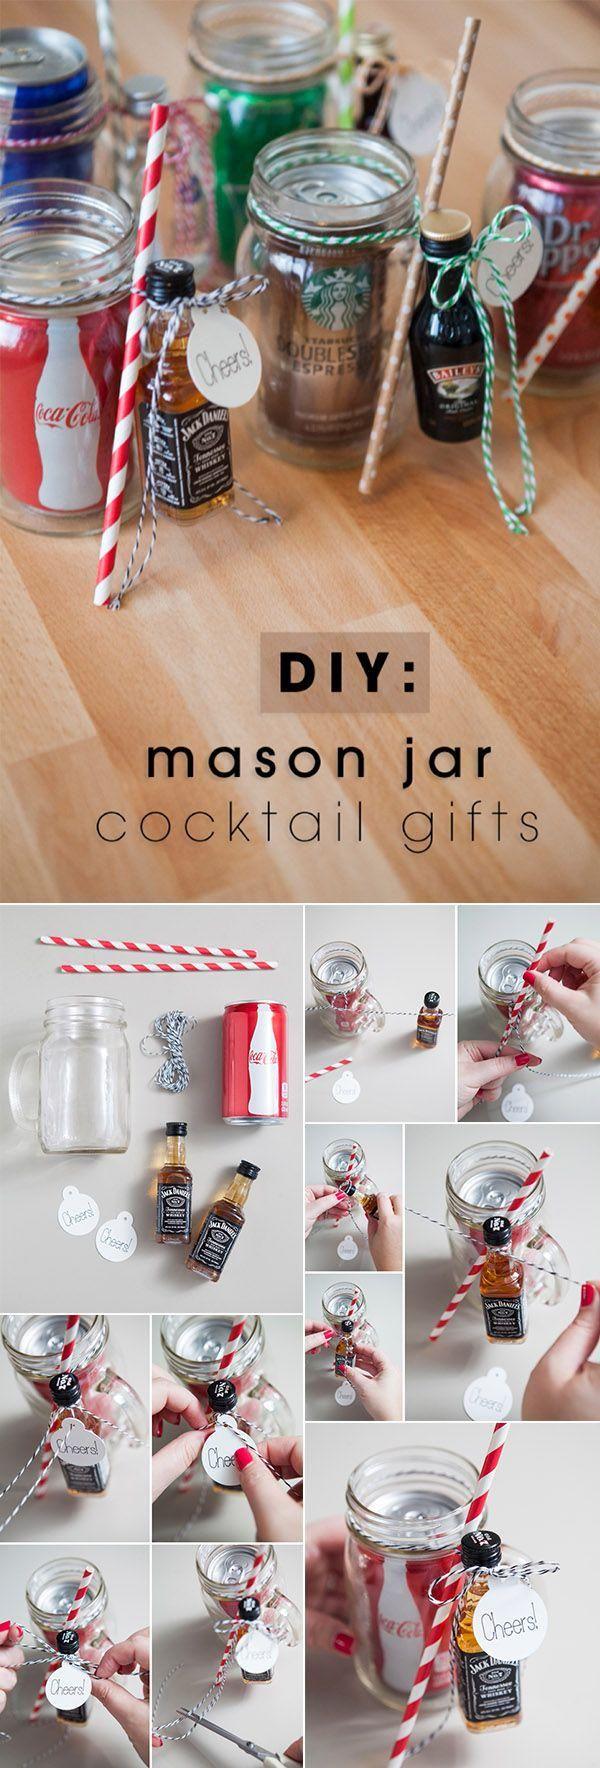 diy office gifts. DIY Videos! On Diy Office Gifts